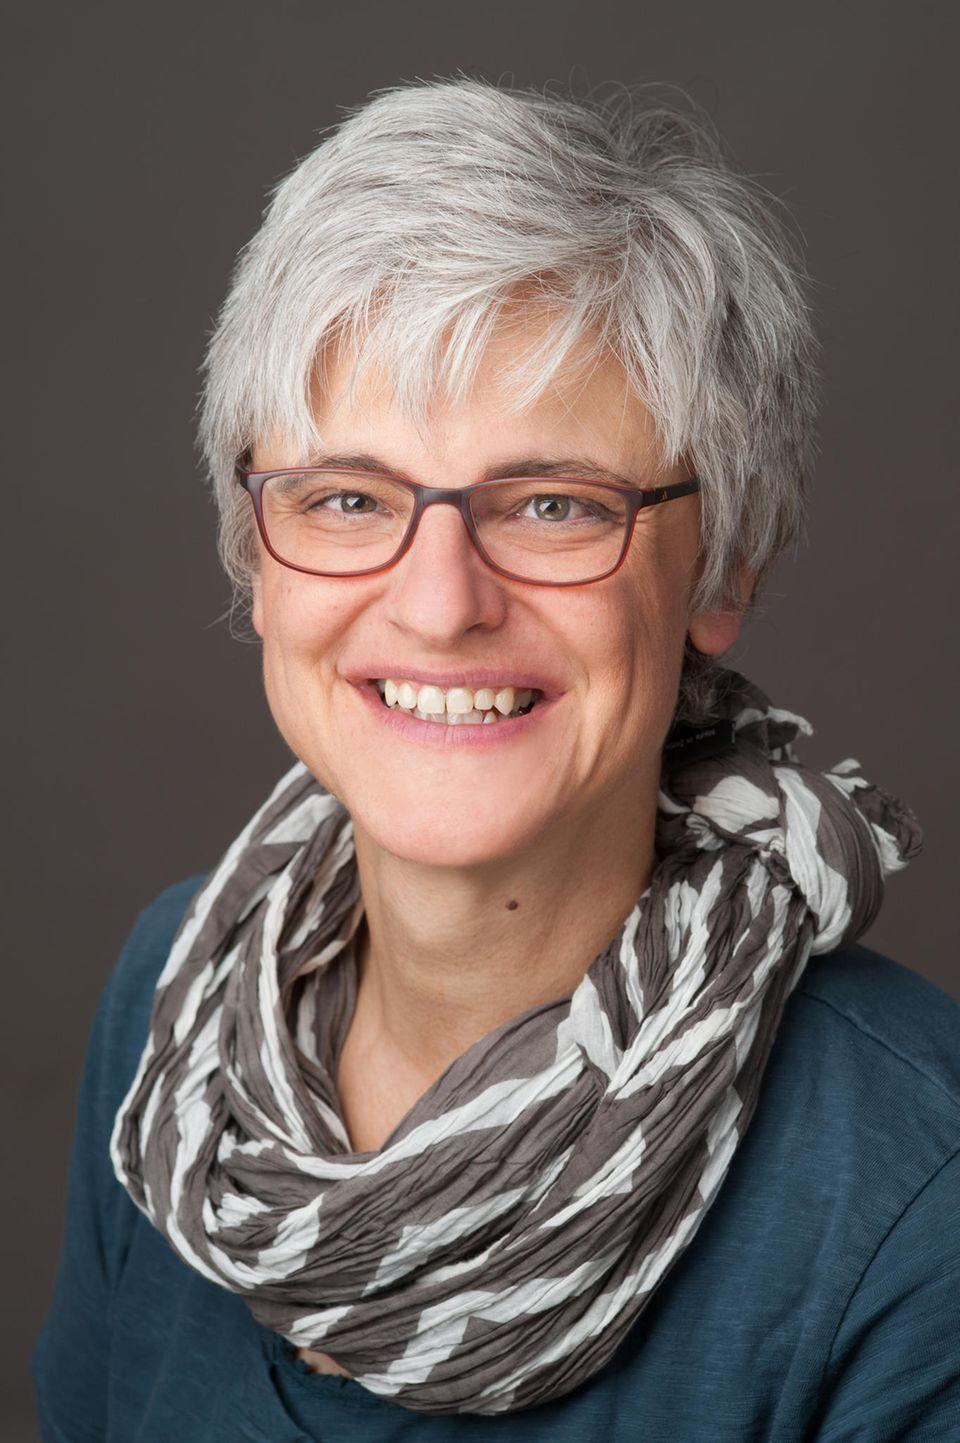 Nach dem Tod des Partners: Ellen Peiffer hilft Betroffenen